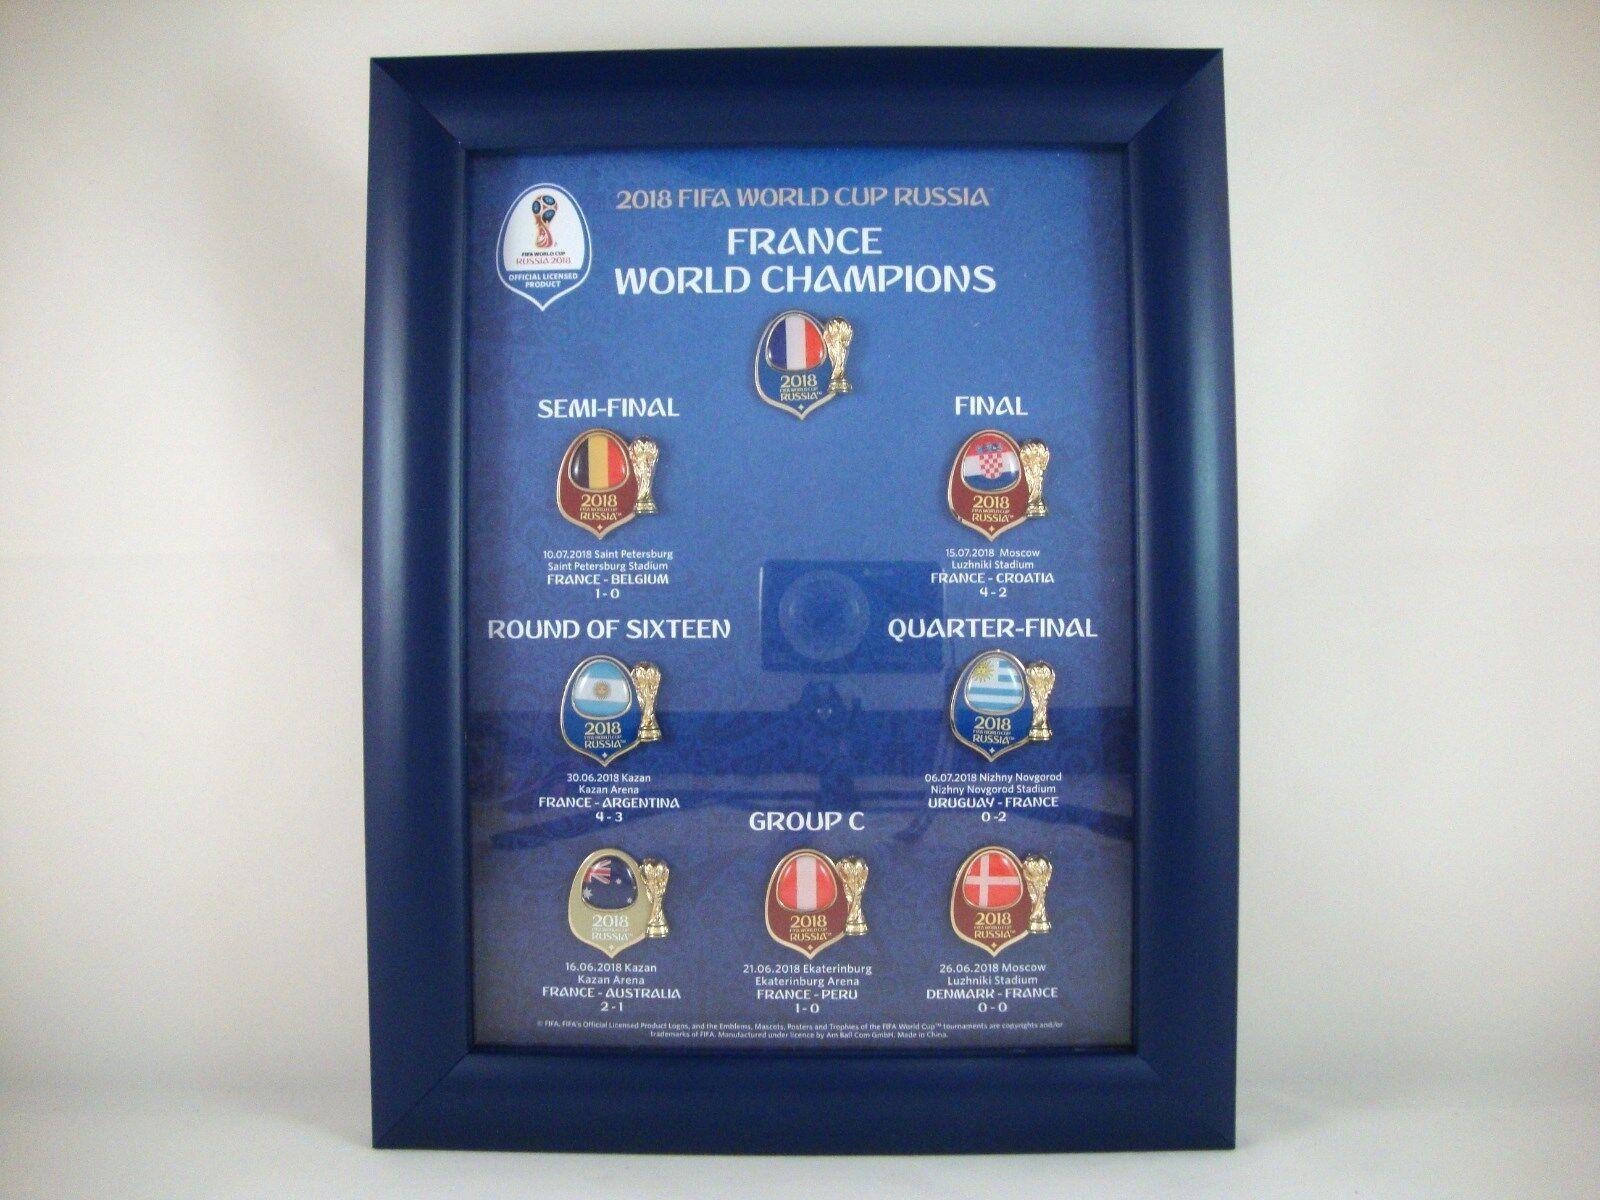 Pin-Rahmen  France World Champions  FIFA World-Cup World-Cup World-Cup 2018 Russia tm Russland Badge  | Export  3caa05